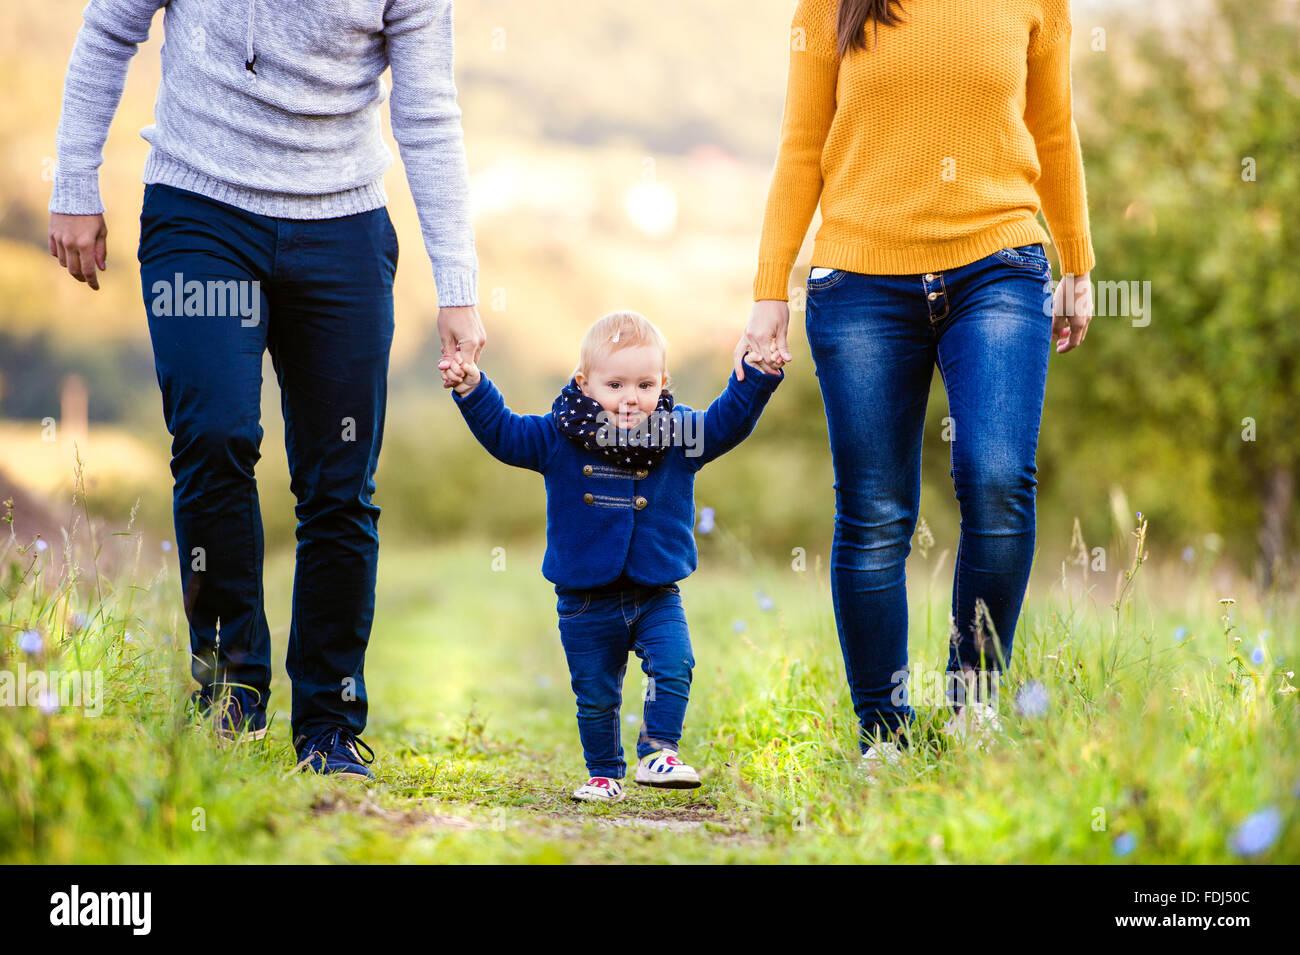 Familia feliz en la naturaleza Imagen De Stock